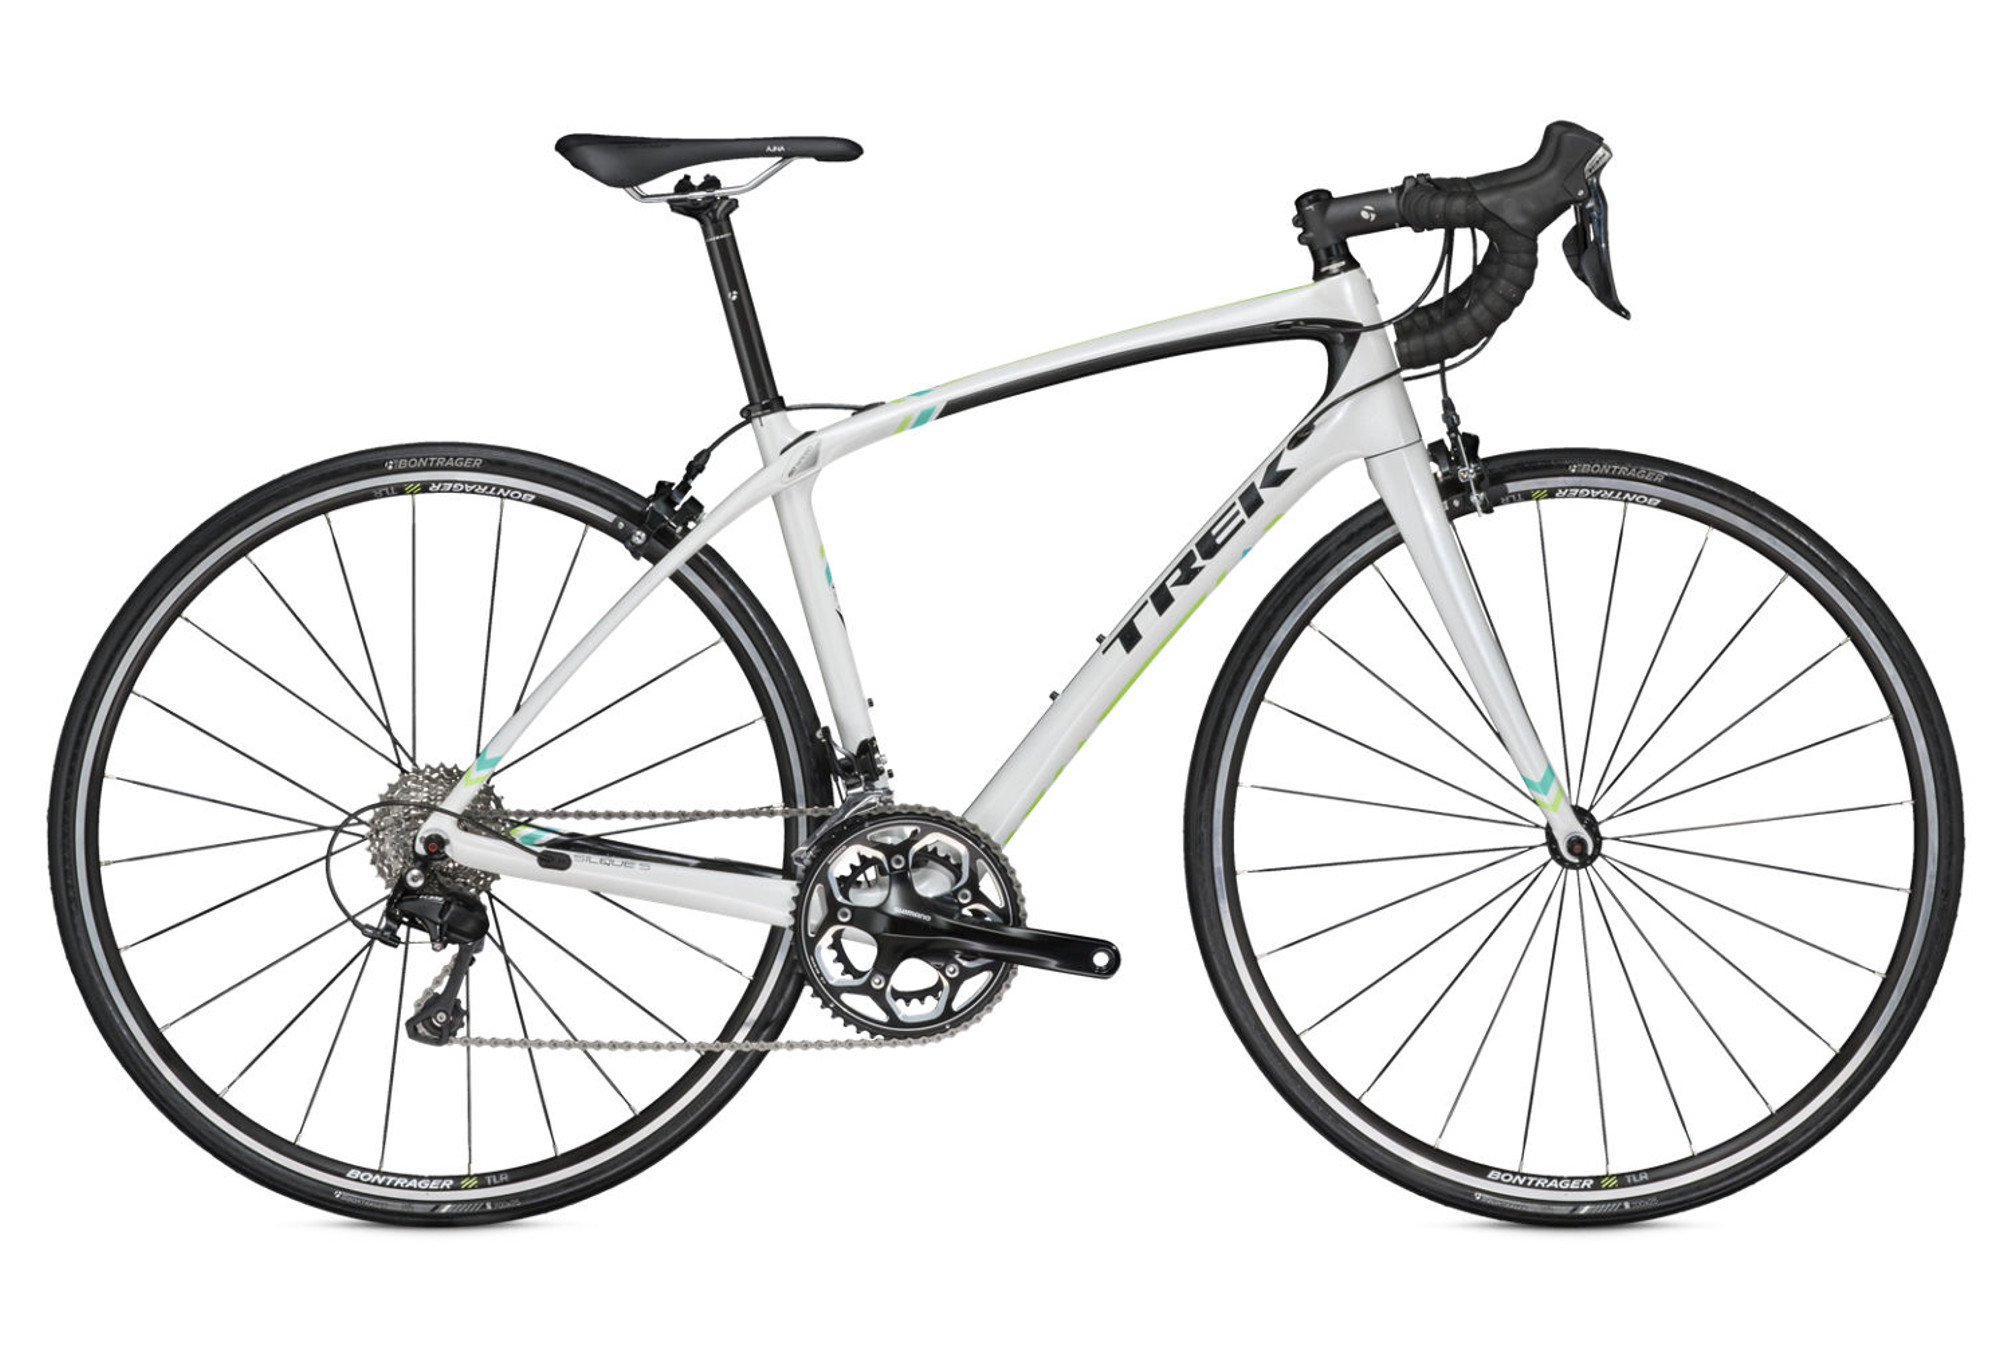 Trek 2016 Silque Sc Road Bike Shimano 105 11 Speed White